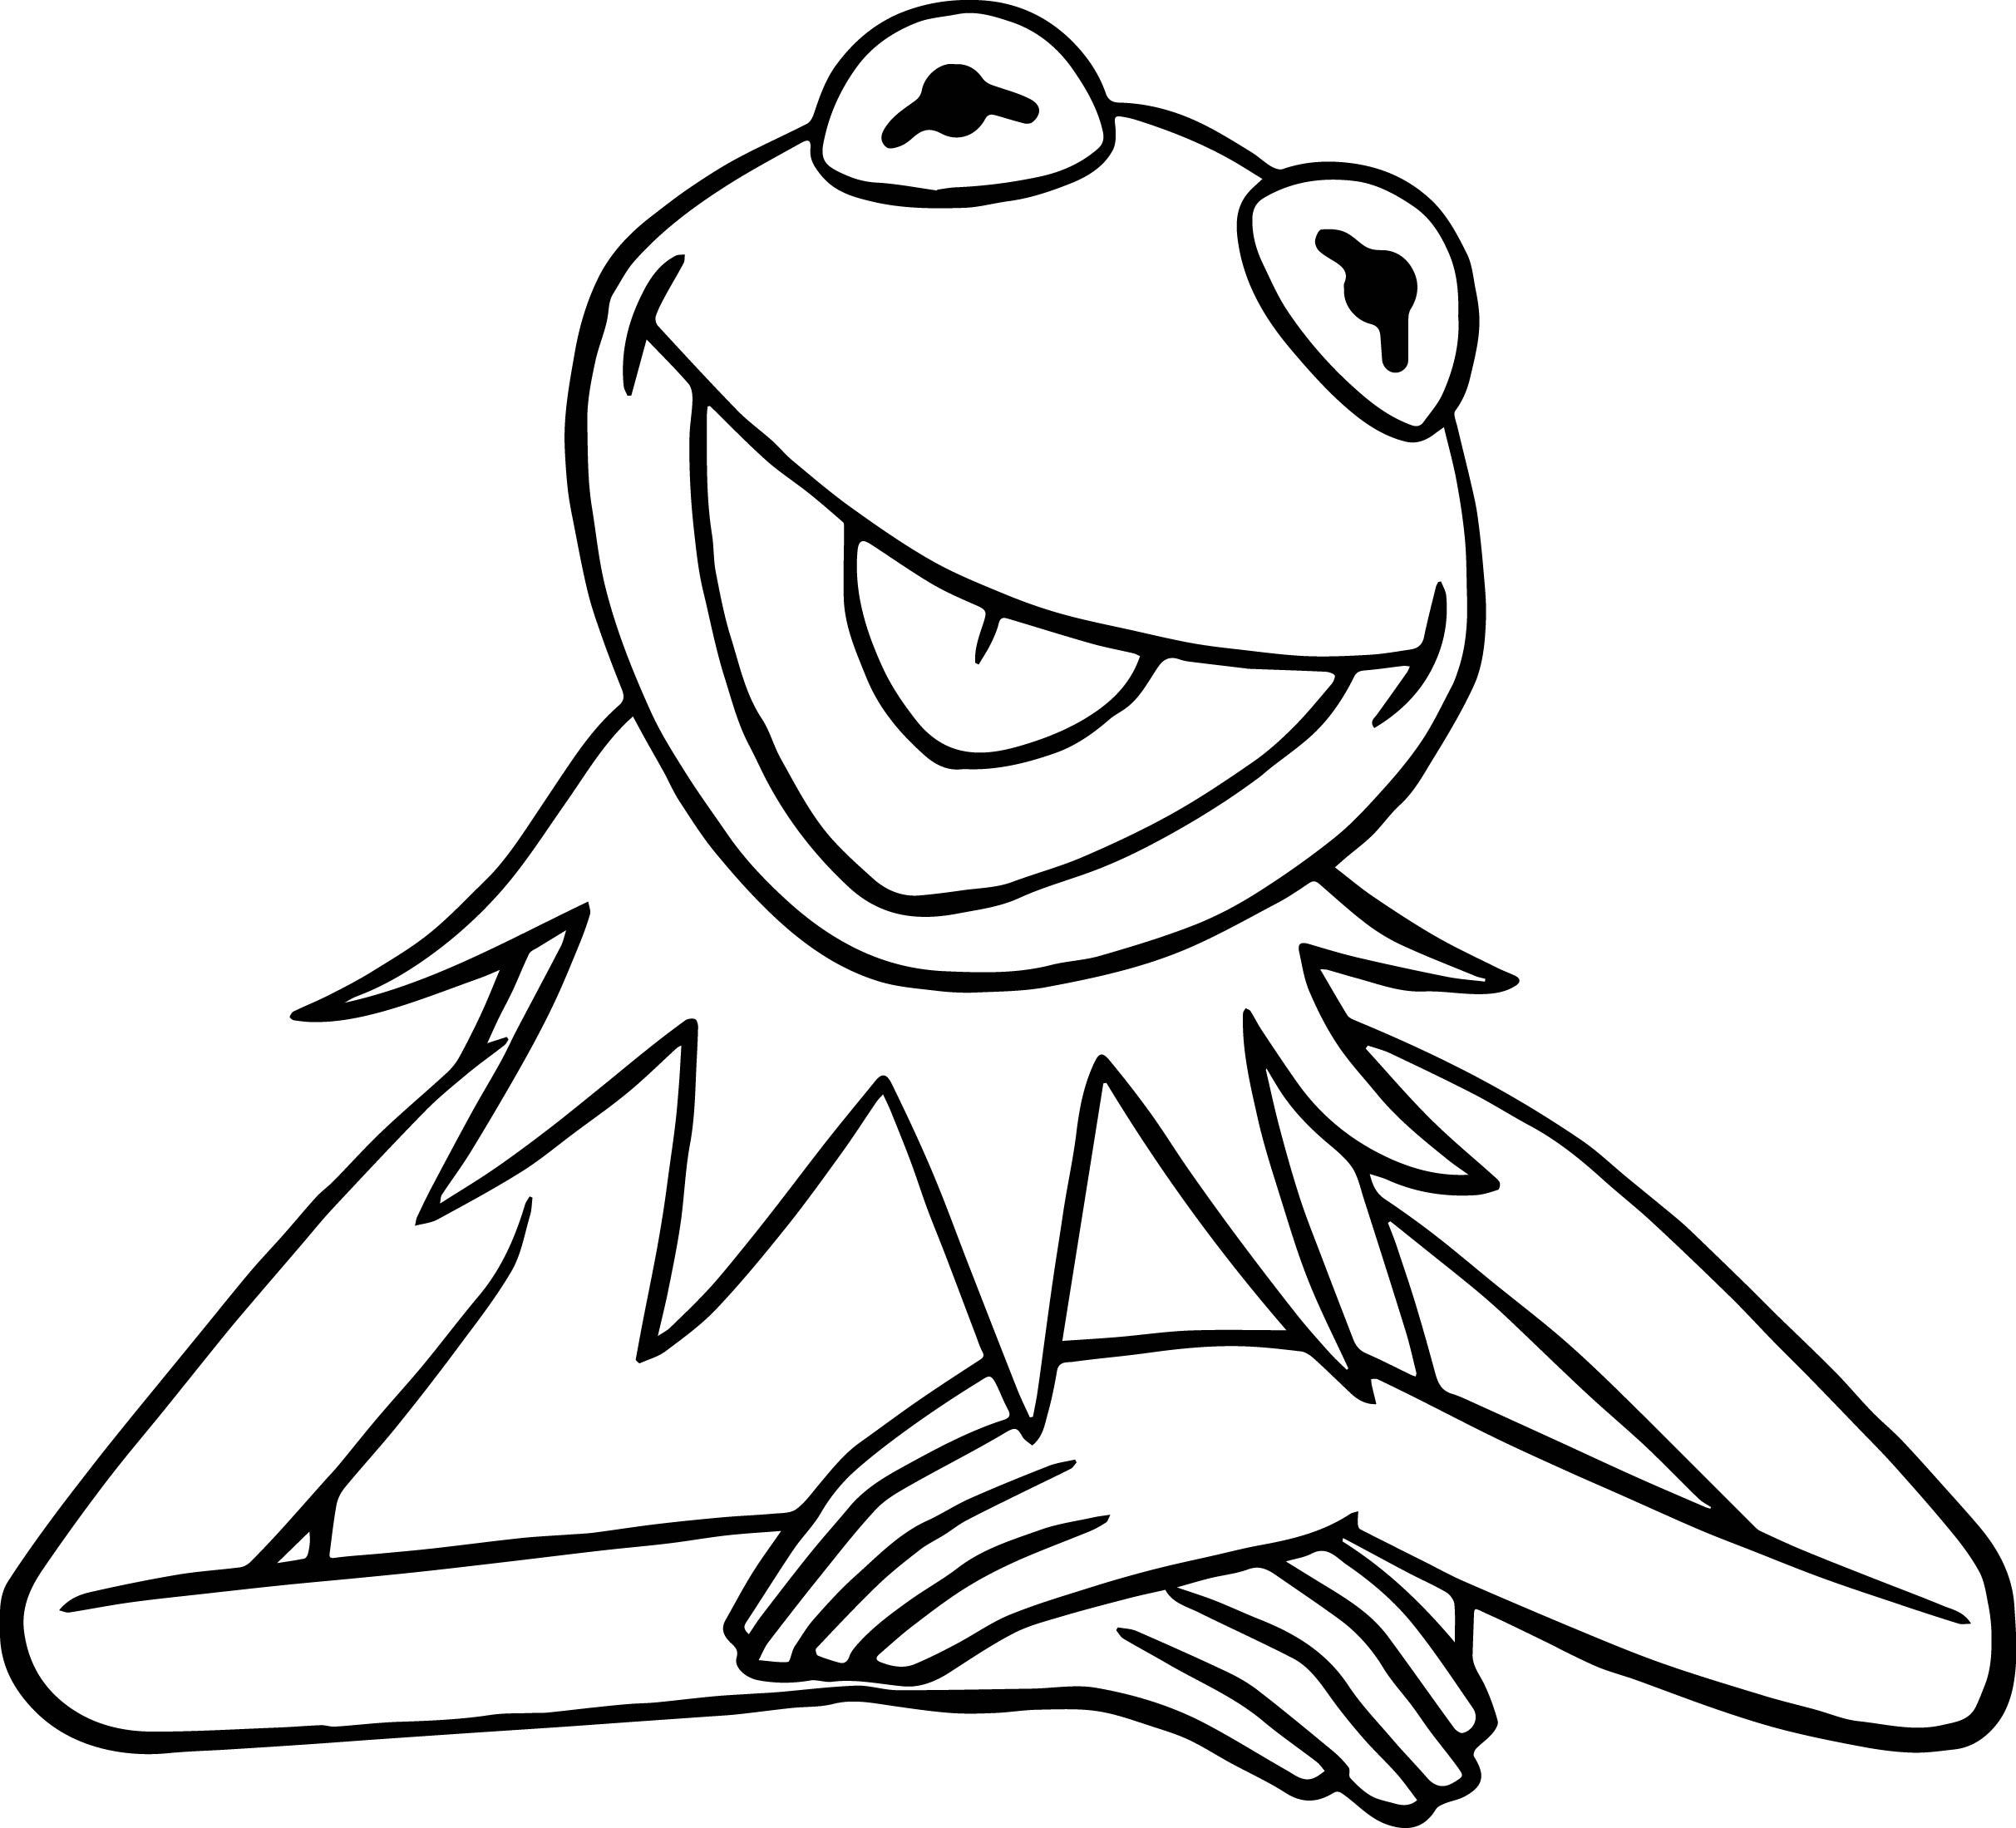 Frog Line Drawing At Getdrawings